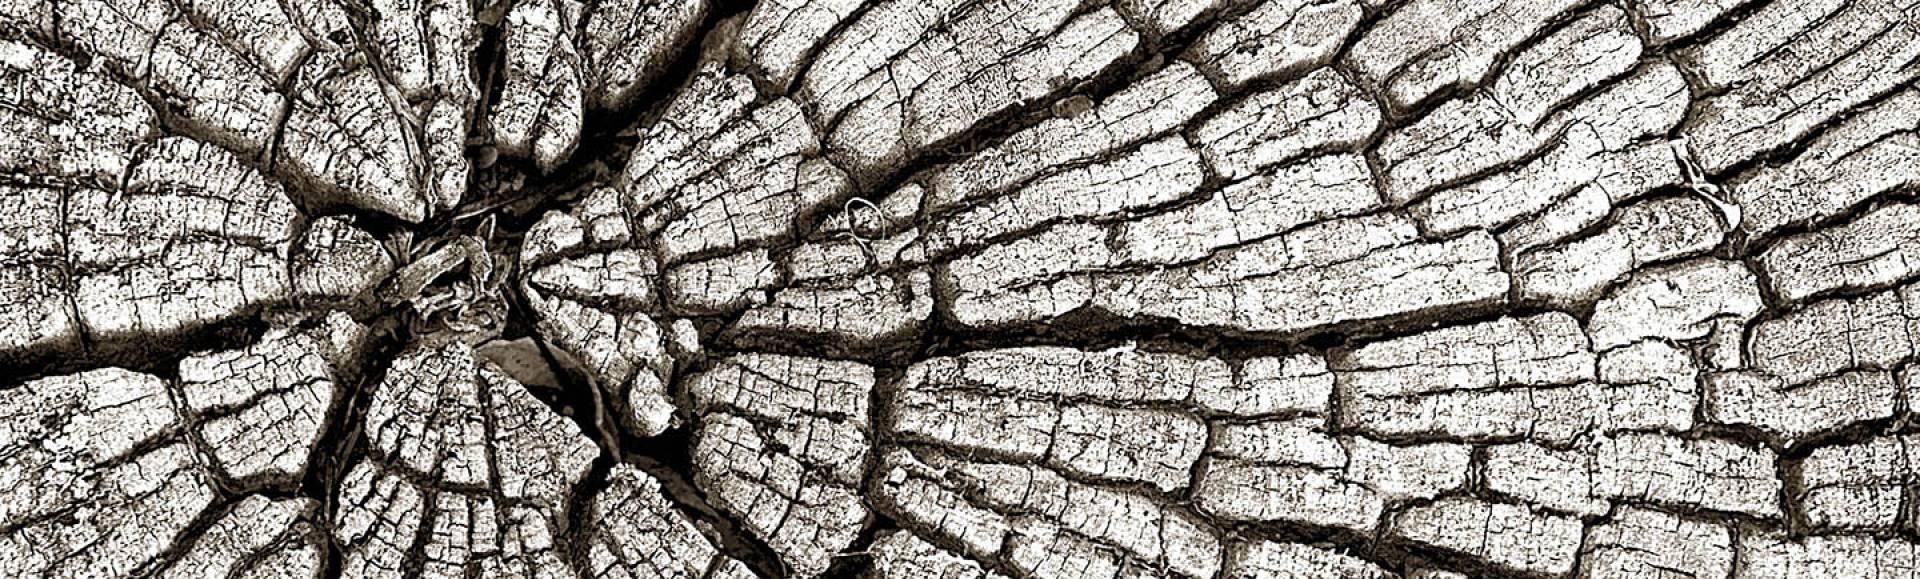 Inspiration ciel terre deco arbrecoupe